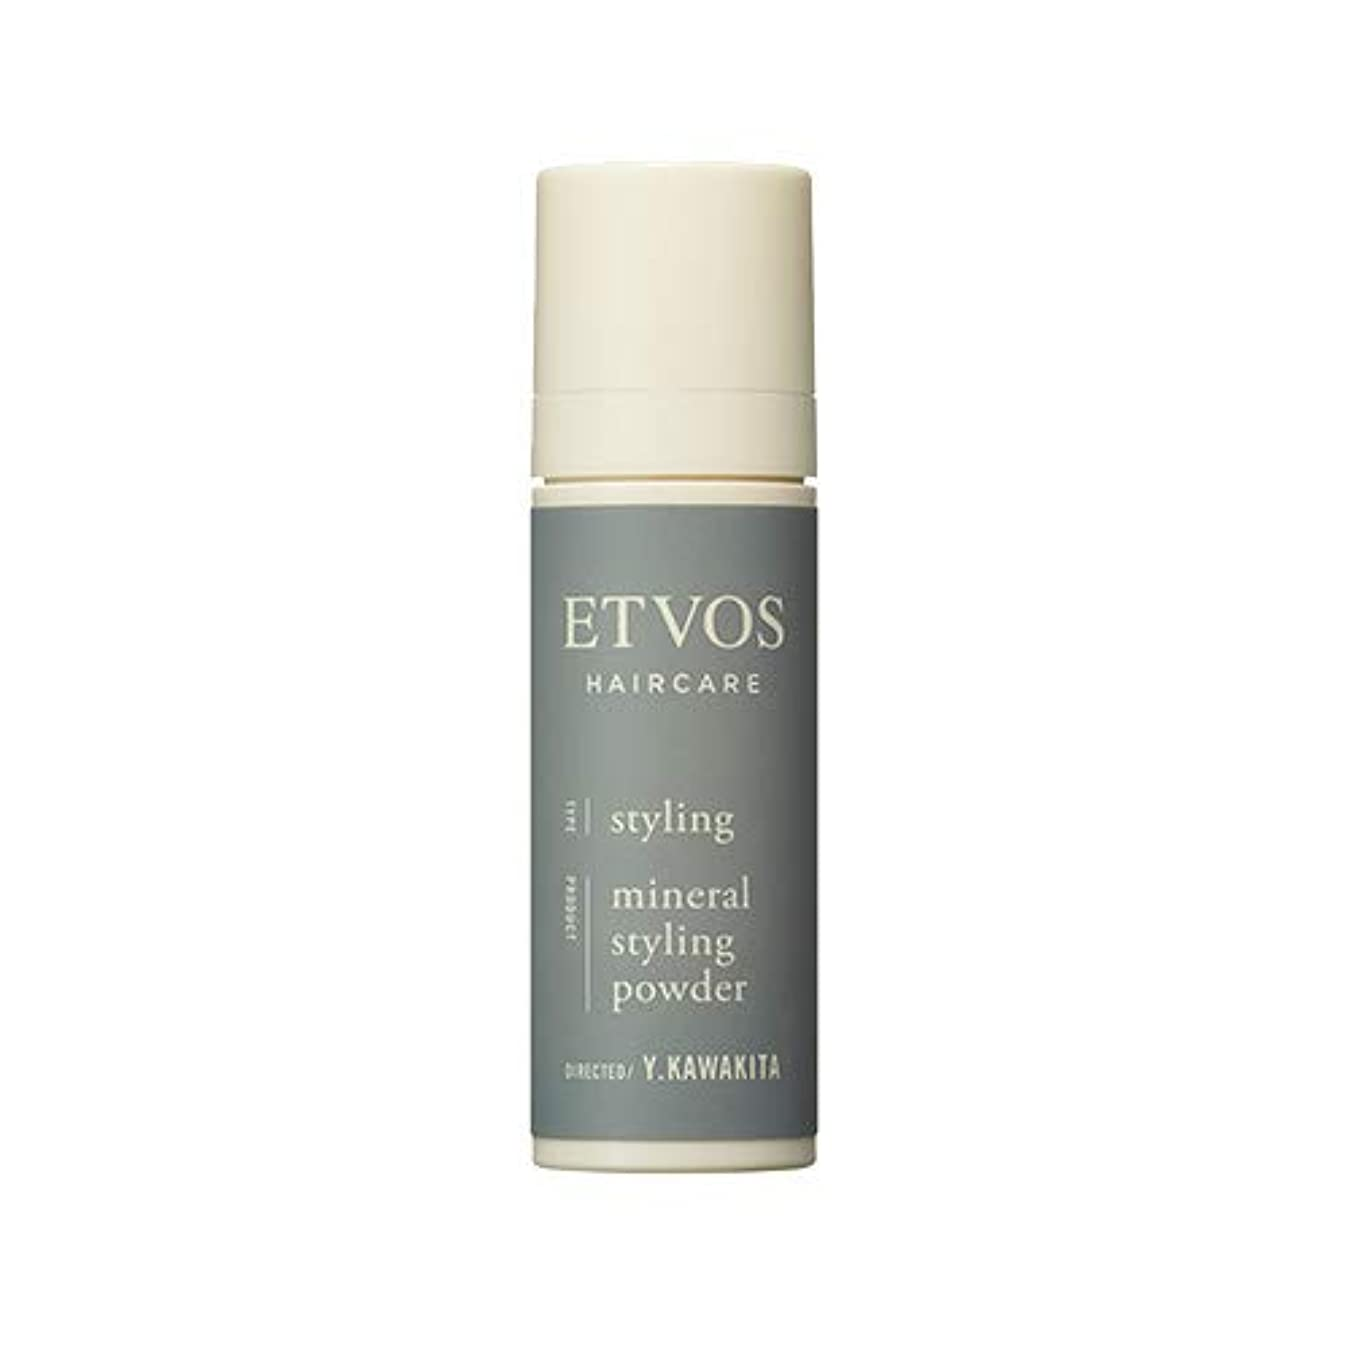 ETVOS(エトヴォス) ミネラルスタイリングパウダー 6g ノンシリコン 頭皮の臭い/汗対策 【河北裕介コラボ】